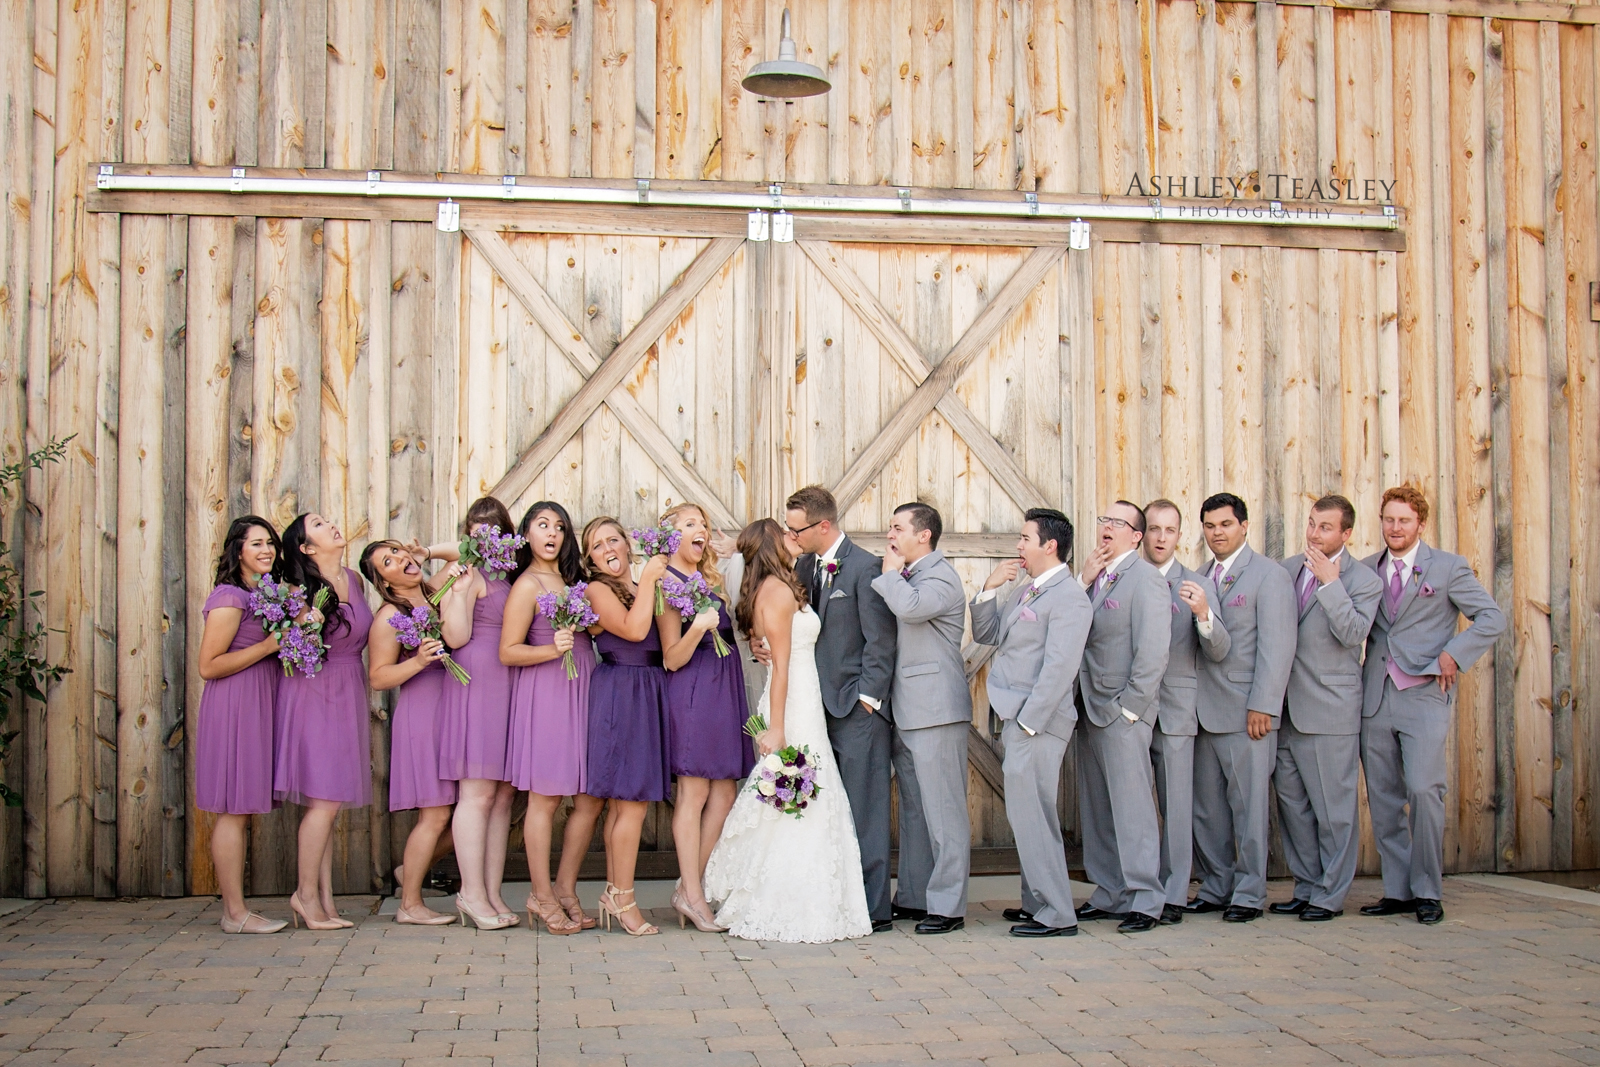 Ashley Teasley Photography - Amador Cellars Winery - Sacramento Wedding Photographer-119.JPG